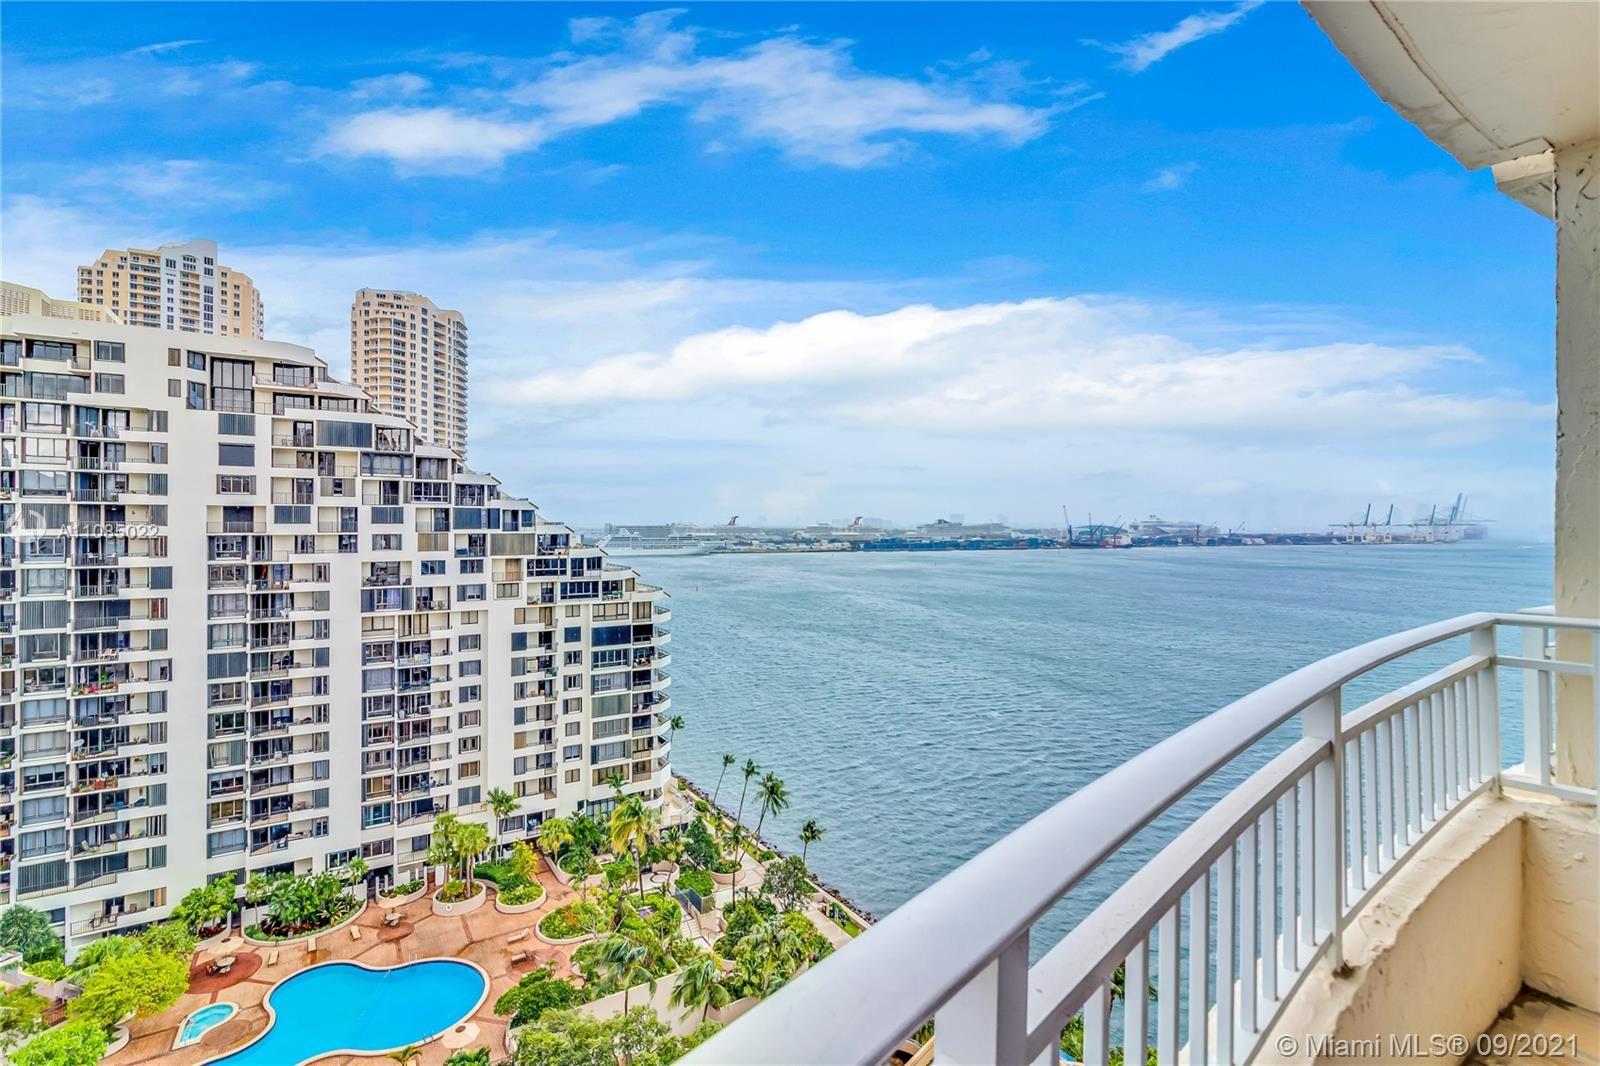 770 Claughton Island Dr #1807, Miami, FL 33131 - #: A11085022